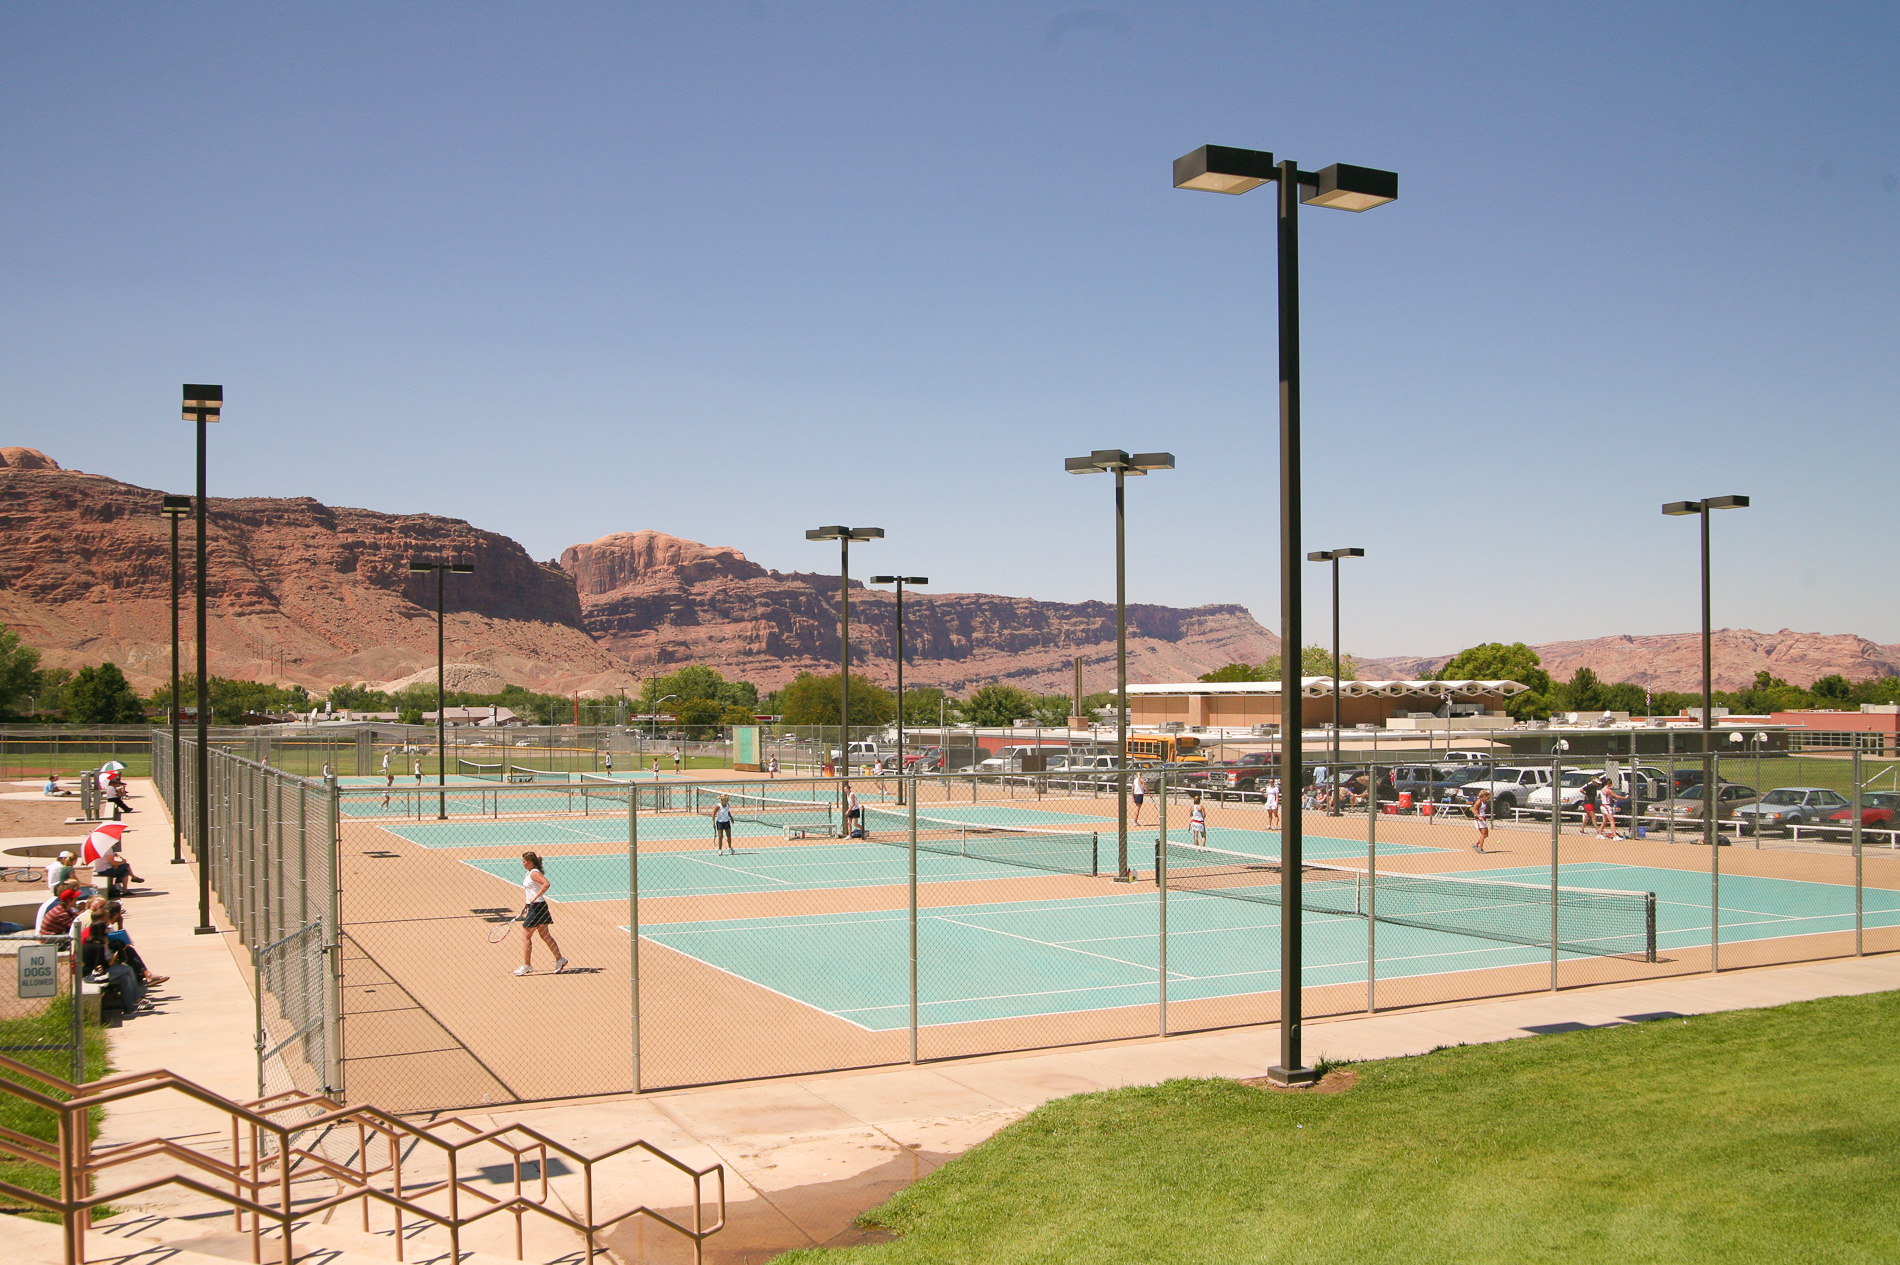 USA・モアブ郊外のテニス場